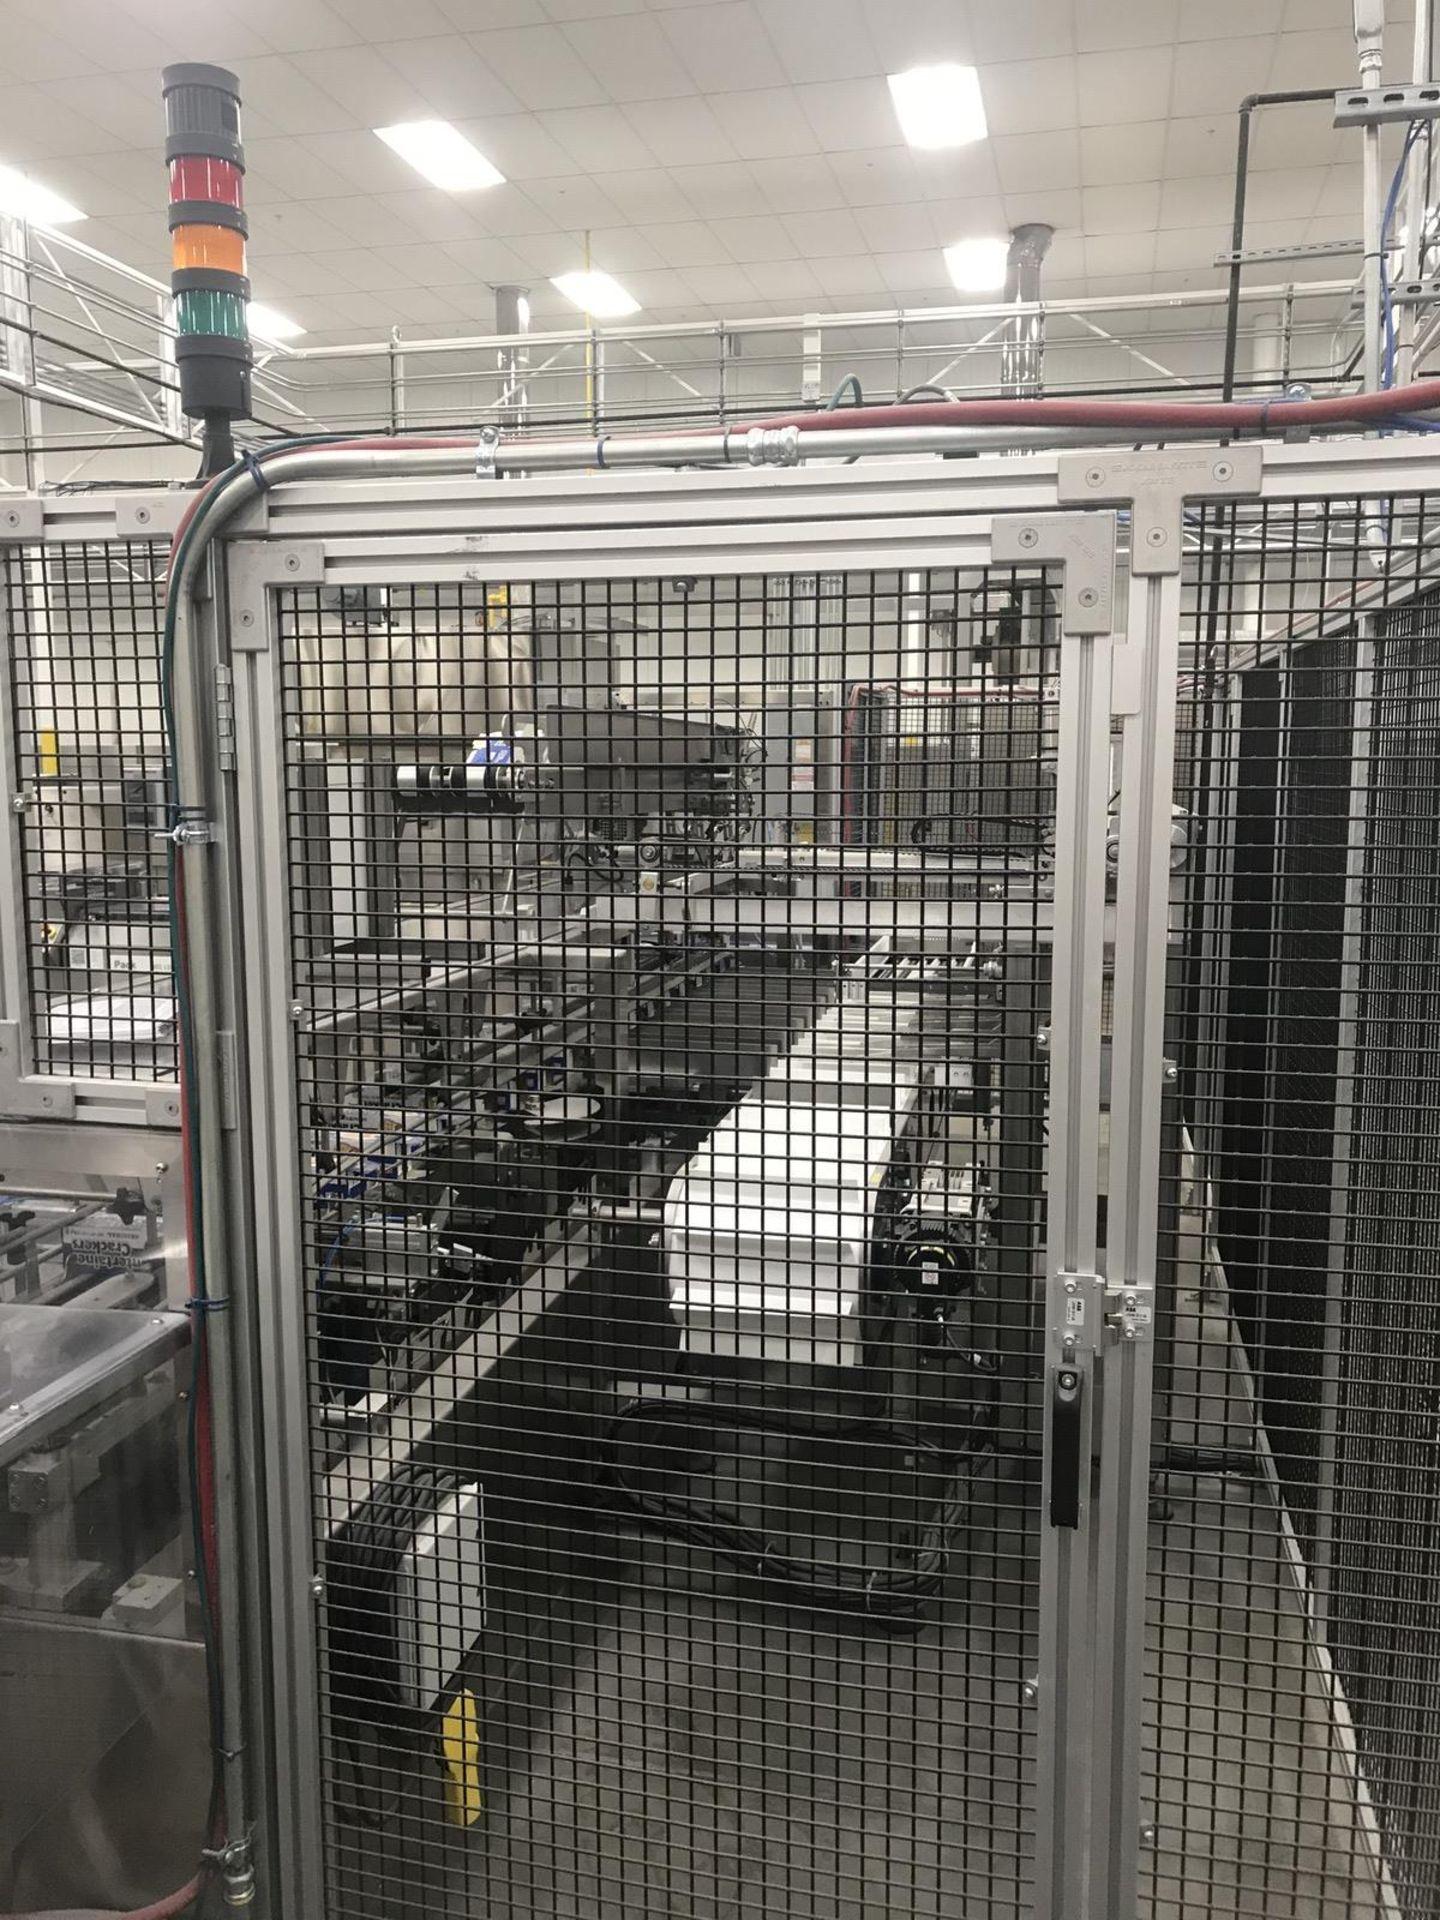 Lot 1H - Consolidated Technologies Model HC-3200 Slug Cartoner, Automatic Servo, S/N: P9176-1A | Subj to Bulk